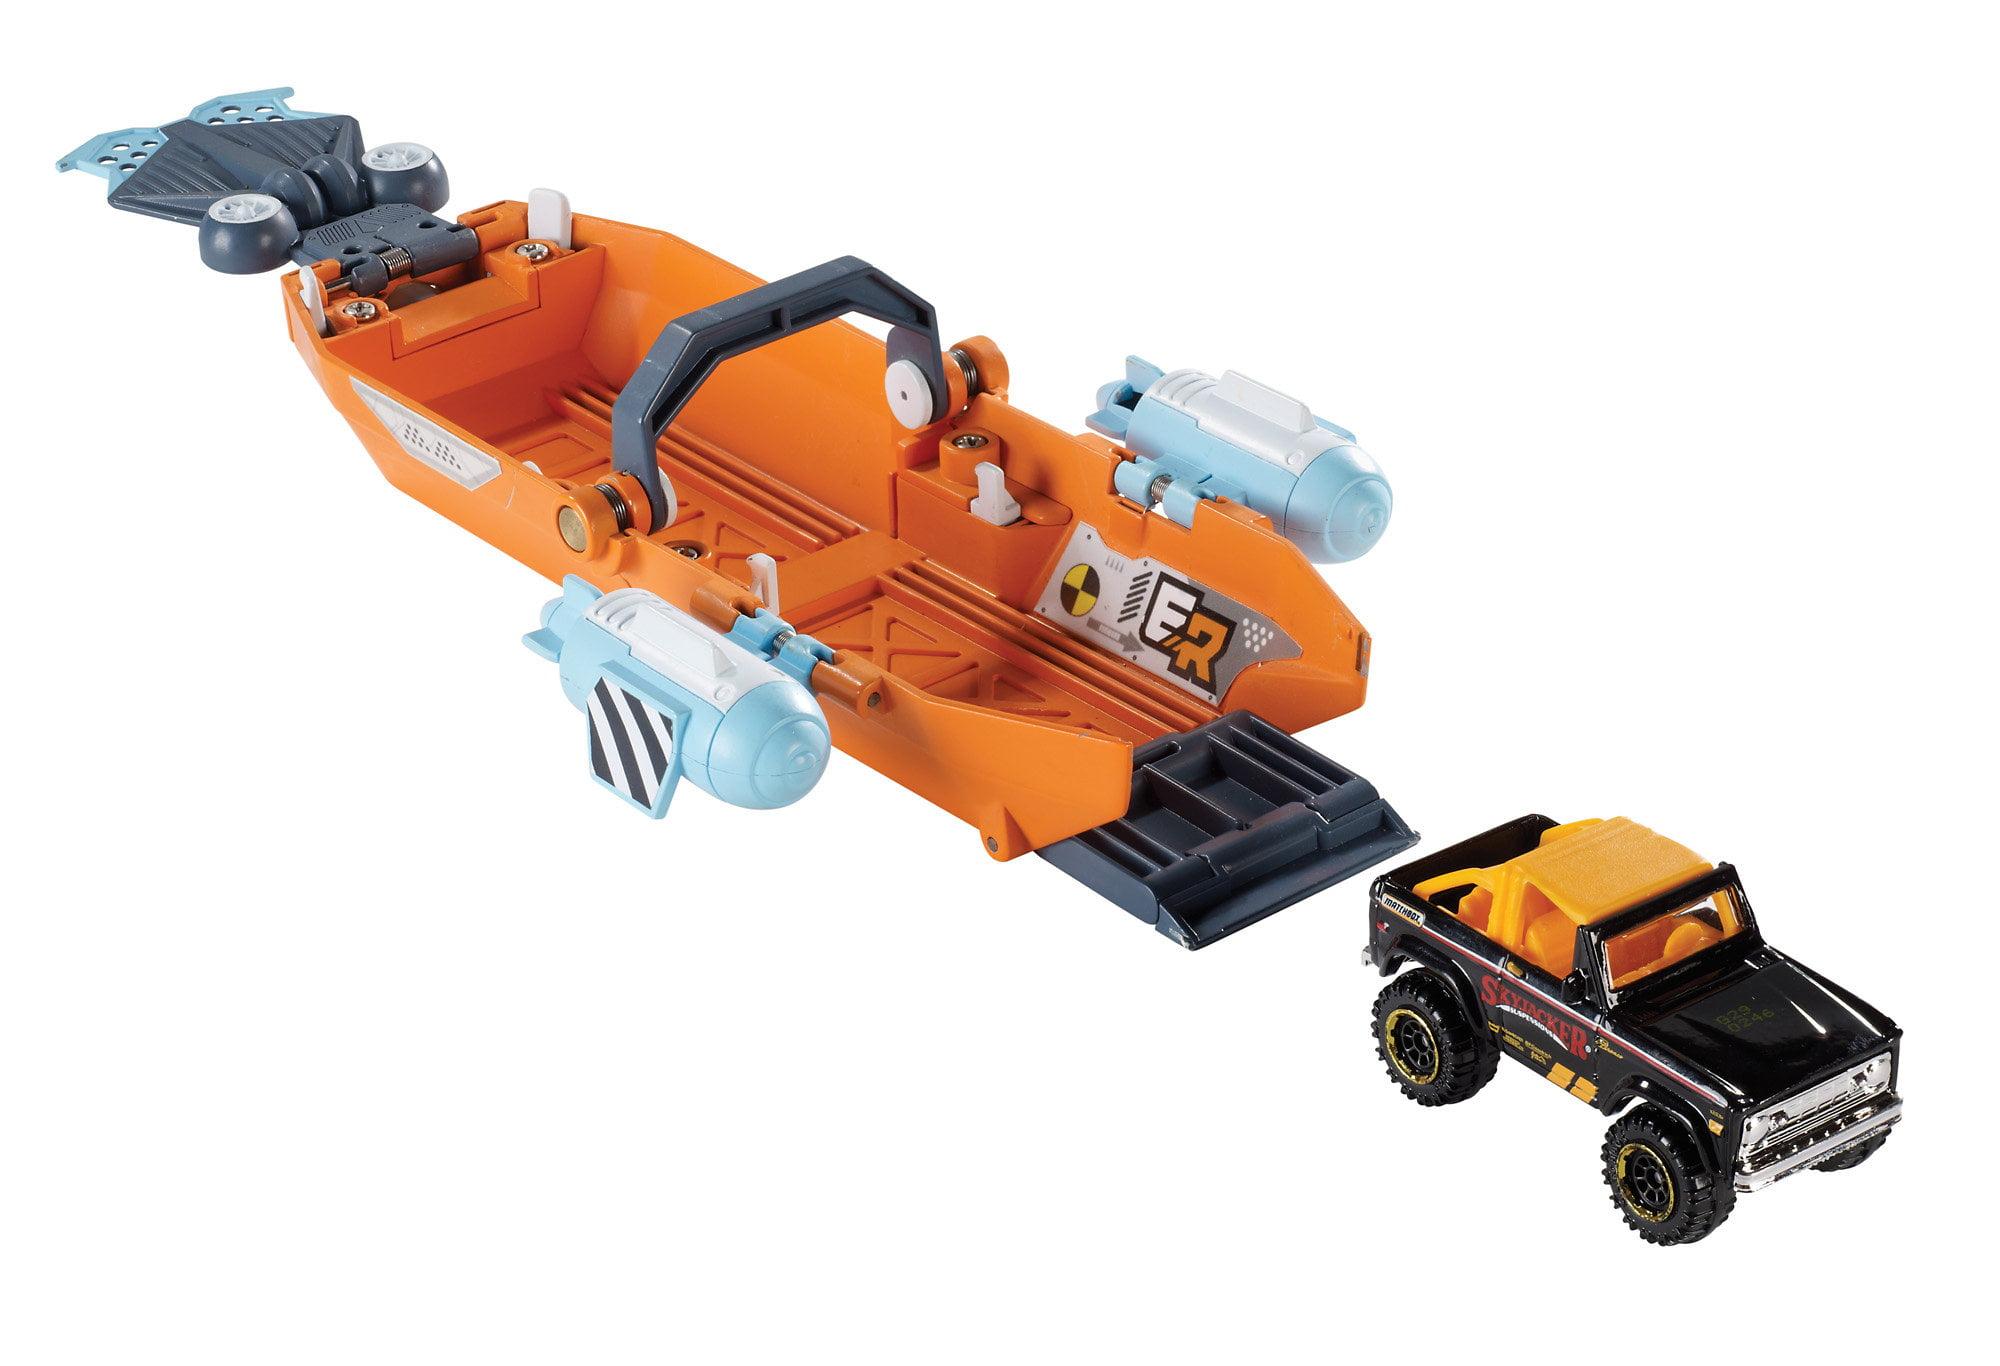 Matchbox Elite Rescue Turbo Canoe by Mattel